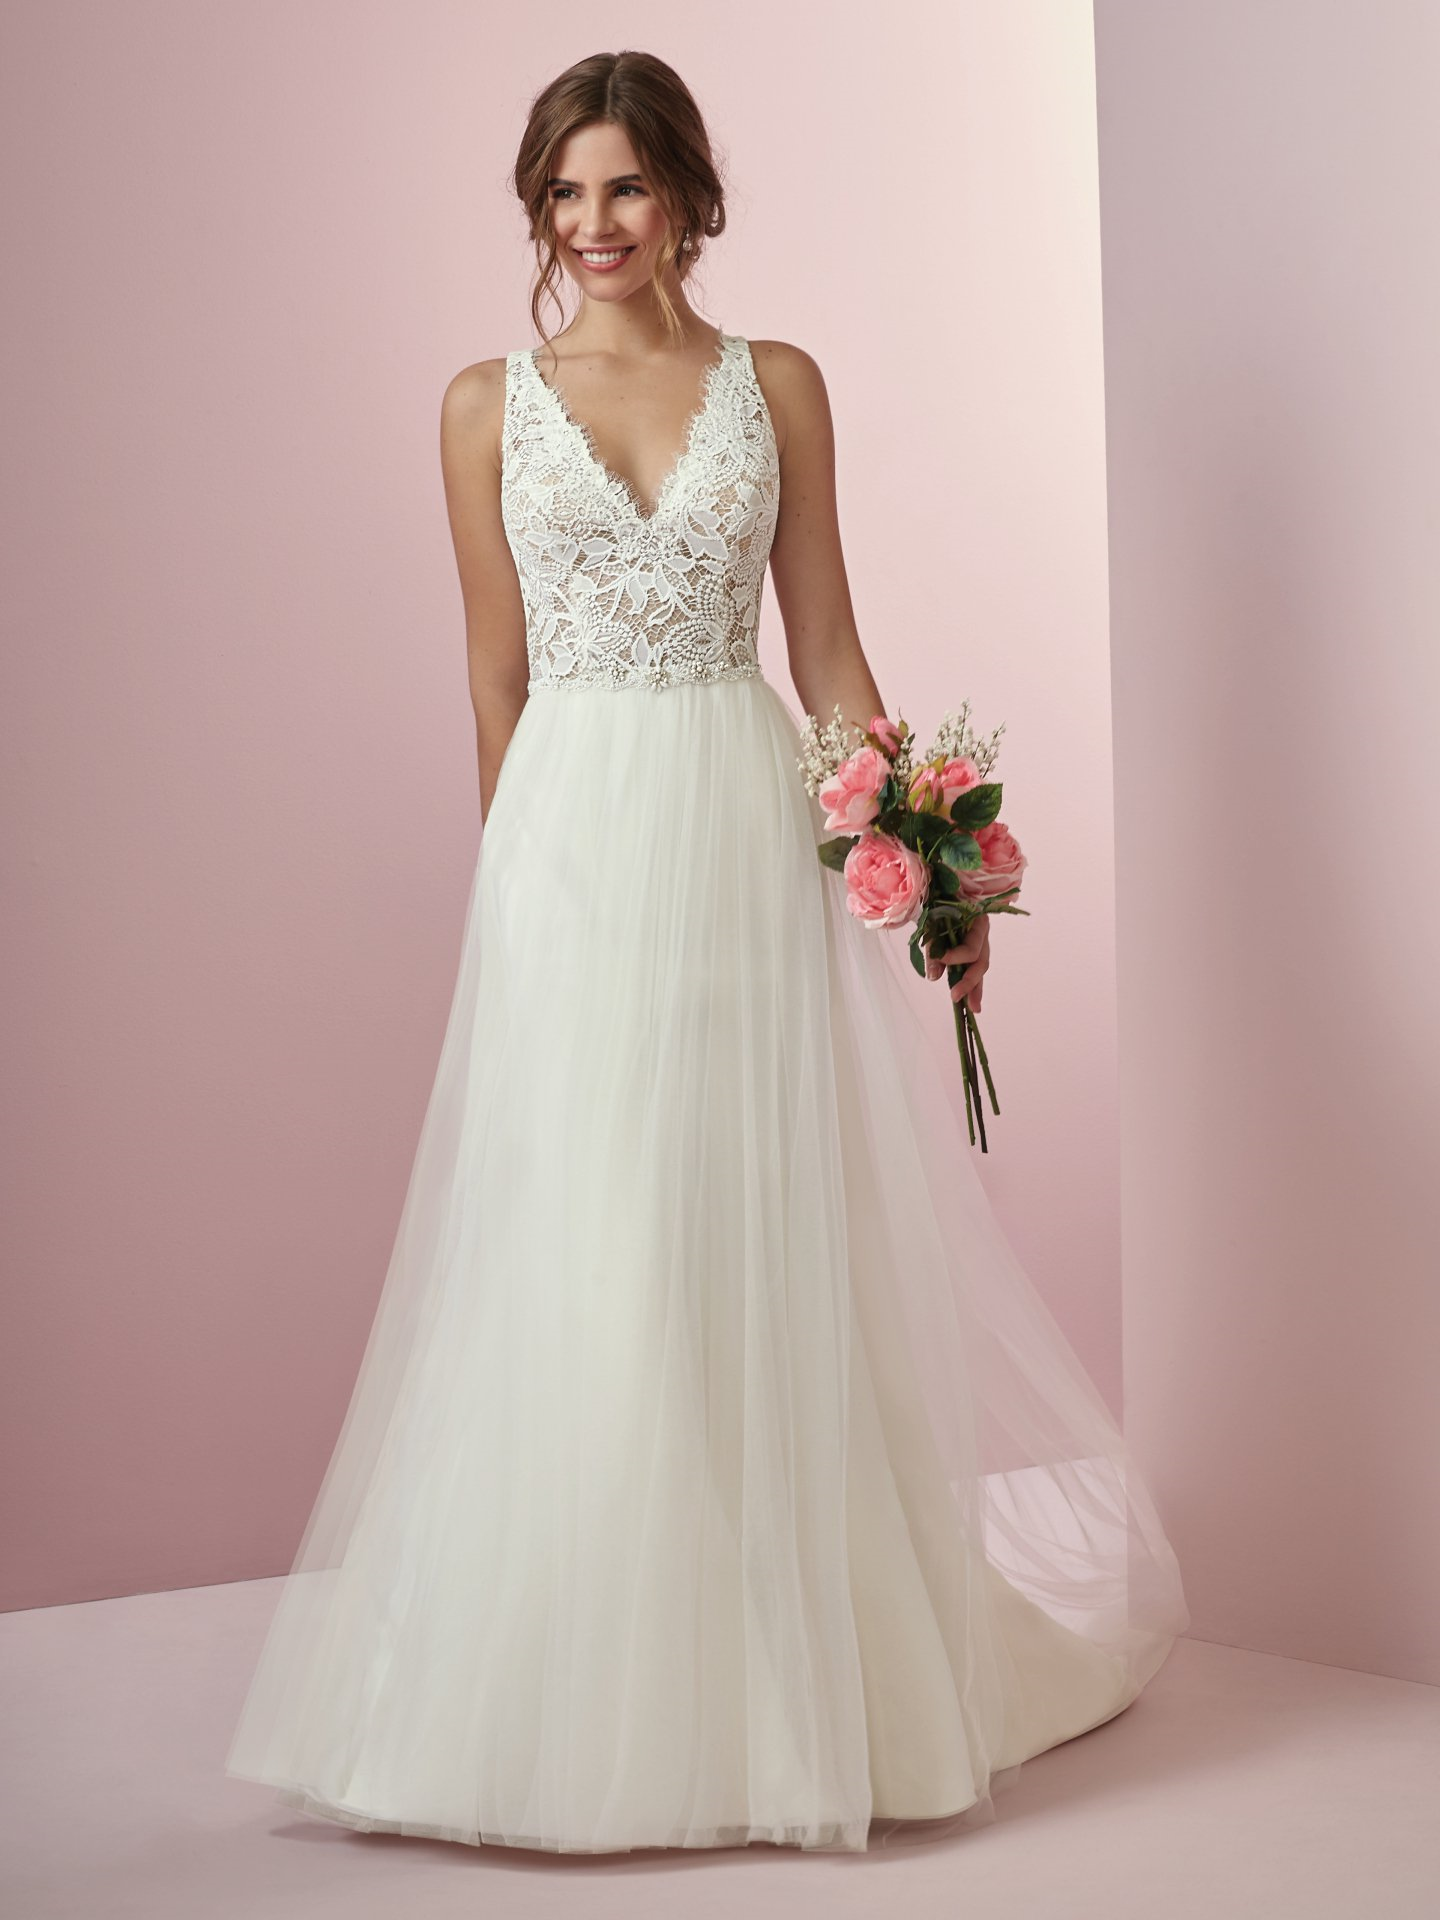 456923459d1 Ivory Bridesmaid Dresses Sydney - Gomes Weine AG